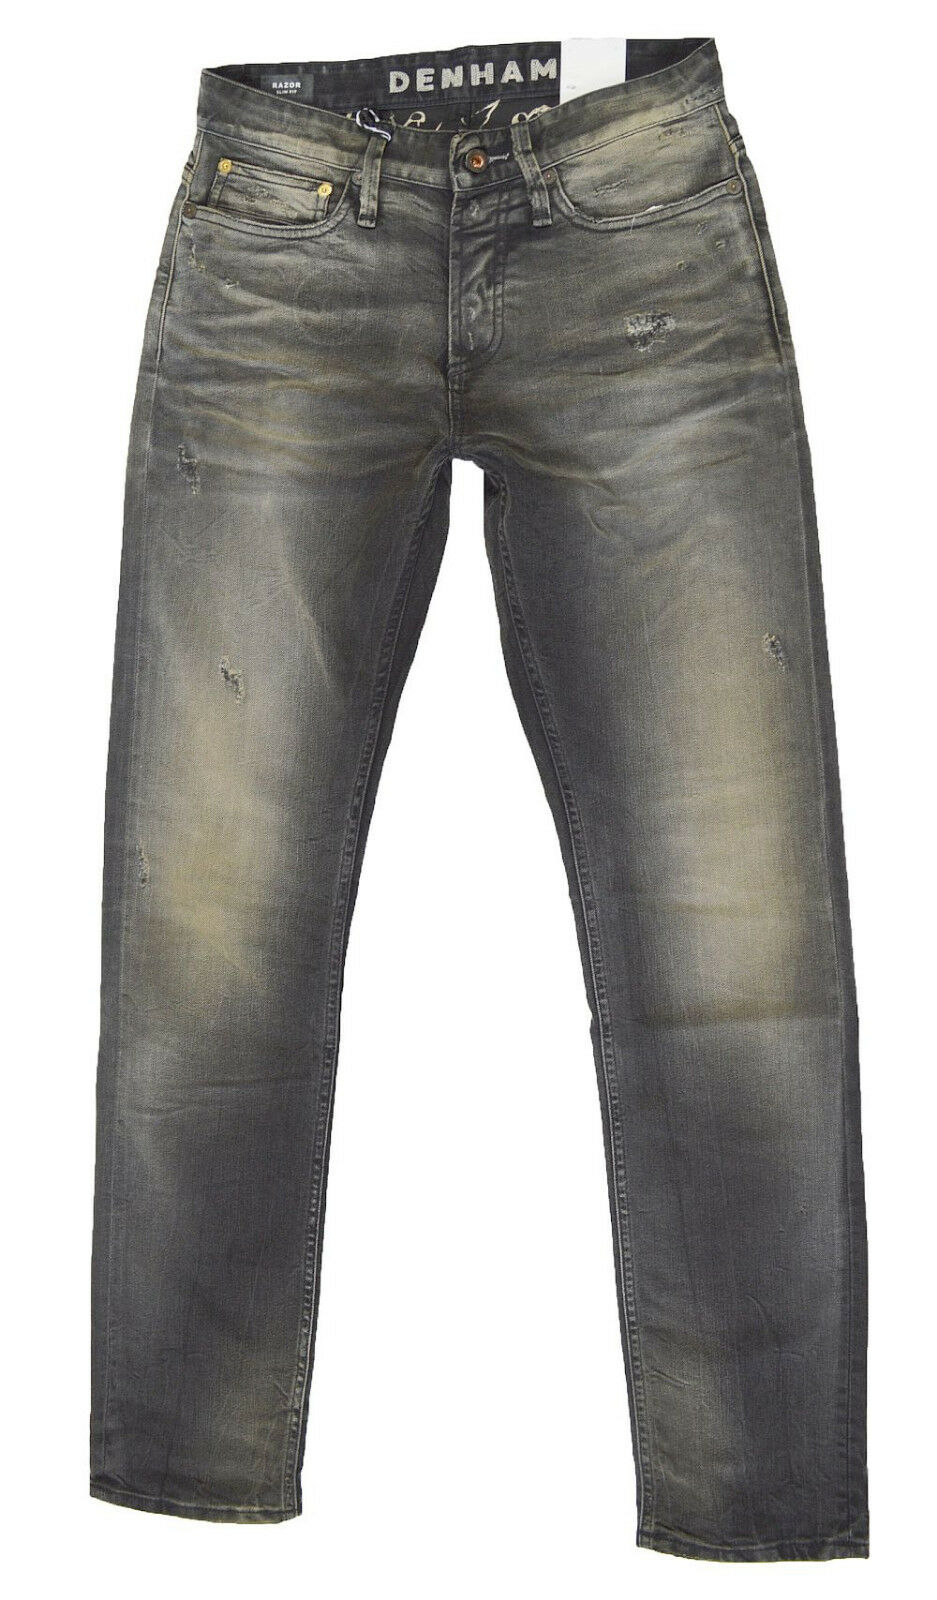 Denham Razor IBSA745 Slim Fit Herren Herren Herren Jeans Hose outlet Jeans Hosen sale 17-1376 0e3af6